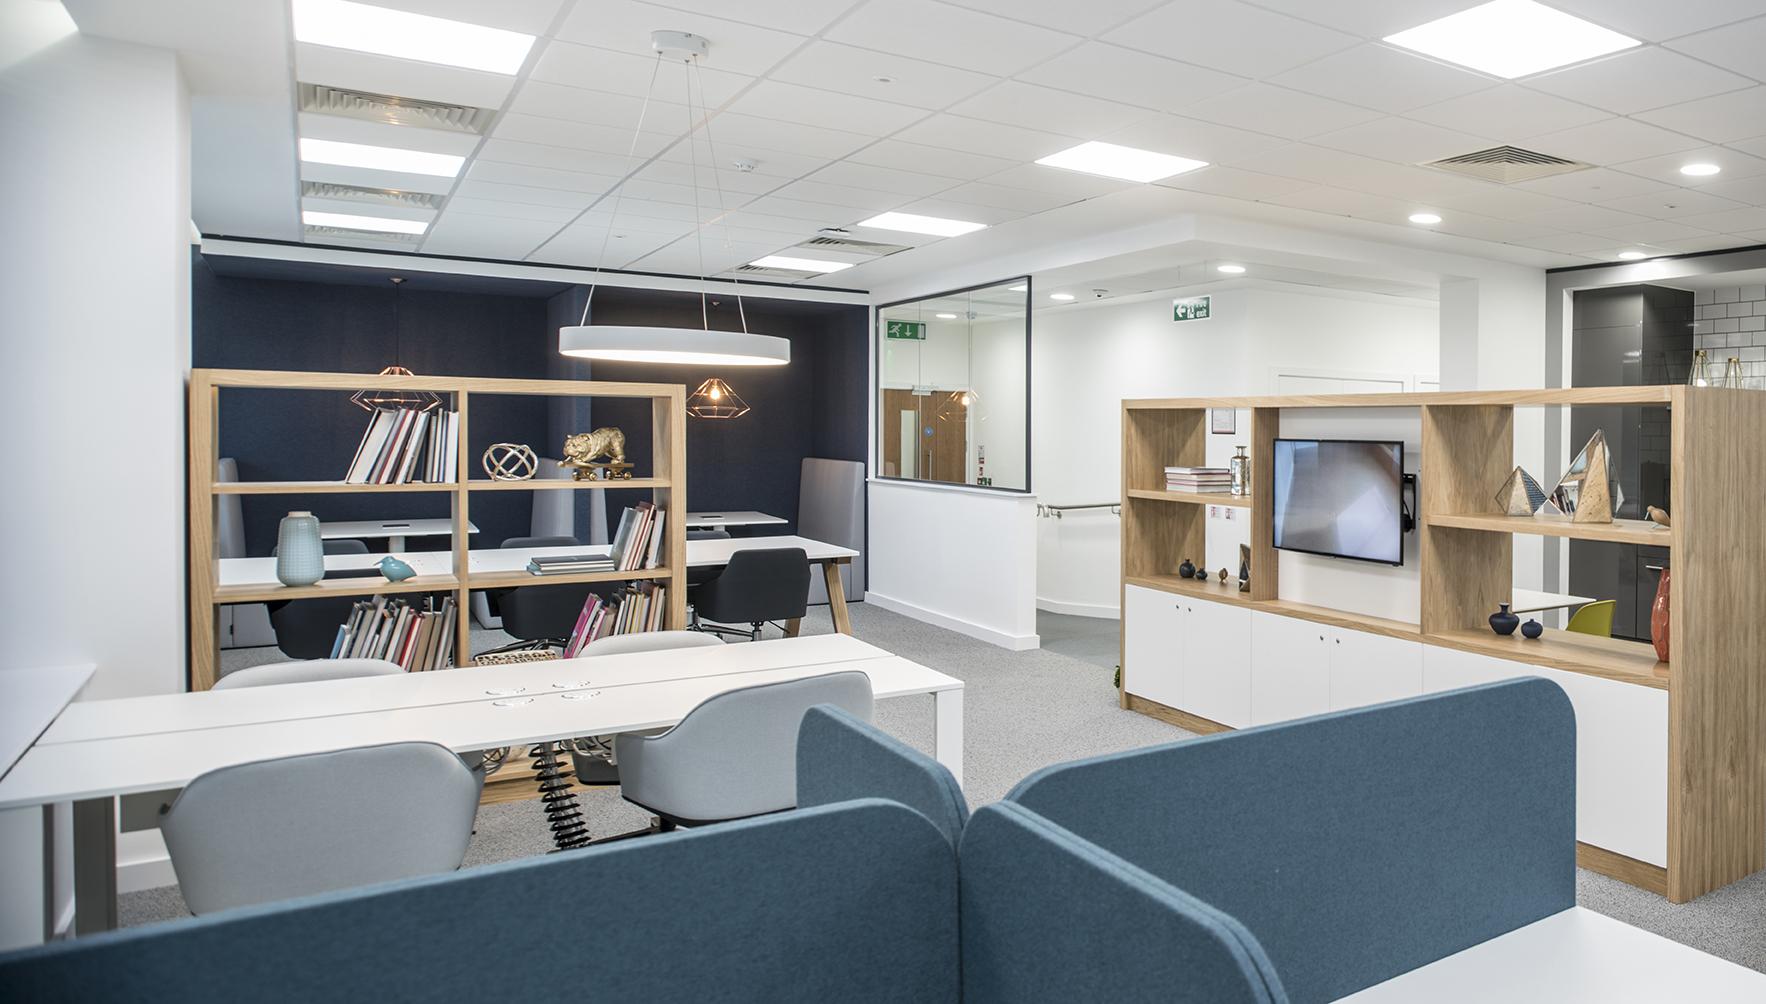 Location bureaux amiens 80000 72m² u2013 bureauxlocaux.com